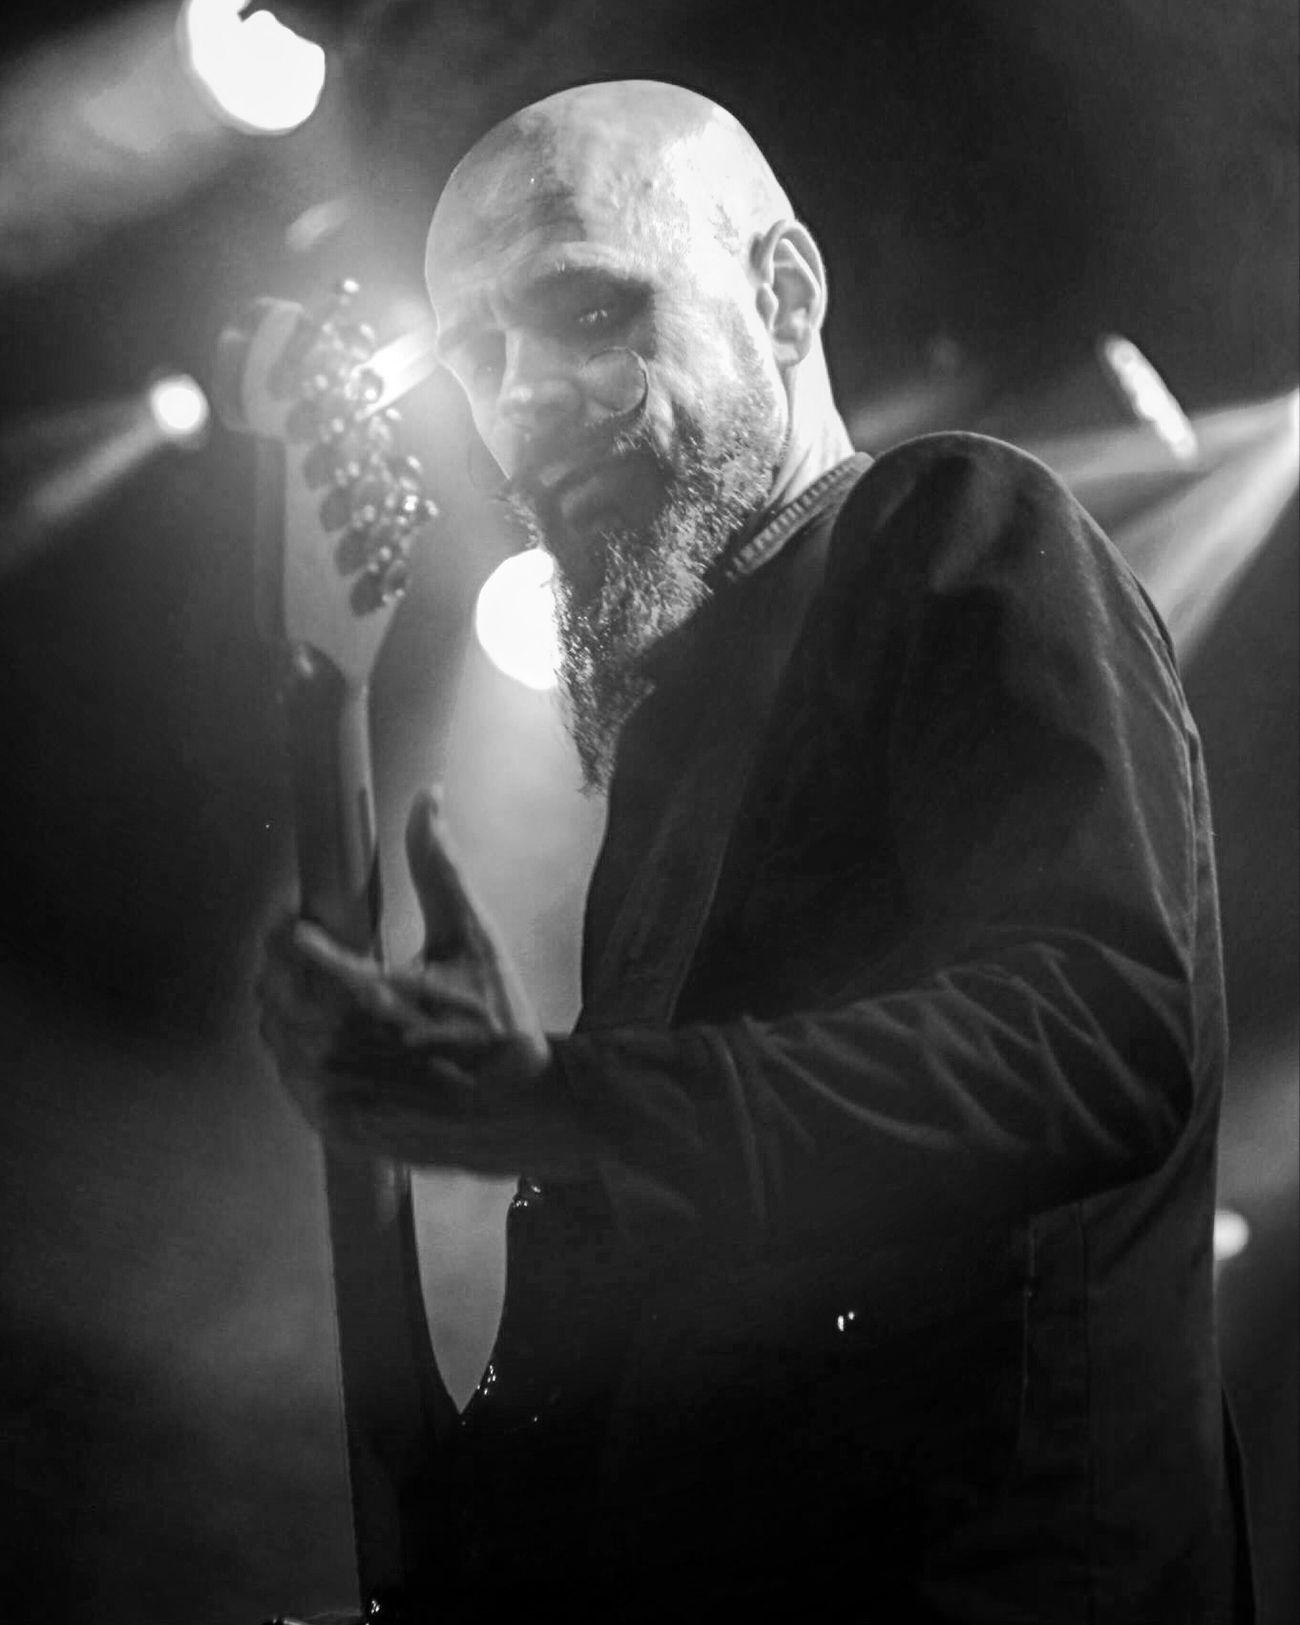 MIKA VANDBORG on guitar The Photojournalist - 2017 EyeEm Awards EyeEm Best Shots Concert Photography Musician Denmark Beard Music Bnw Guitar Guitarist Pictureoftheday Blackandwhite Aarhus, Denmark Funky Rocknroll Live Music